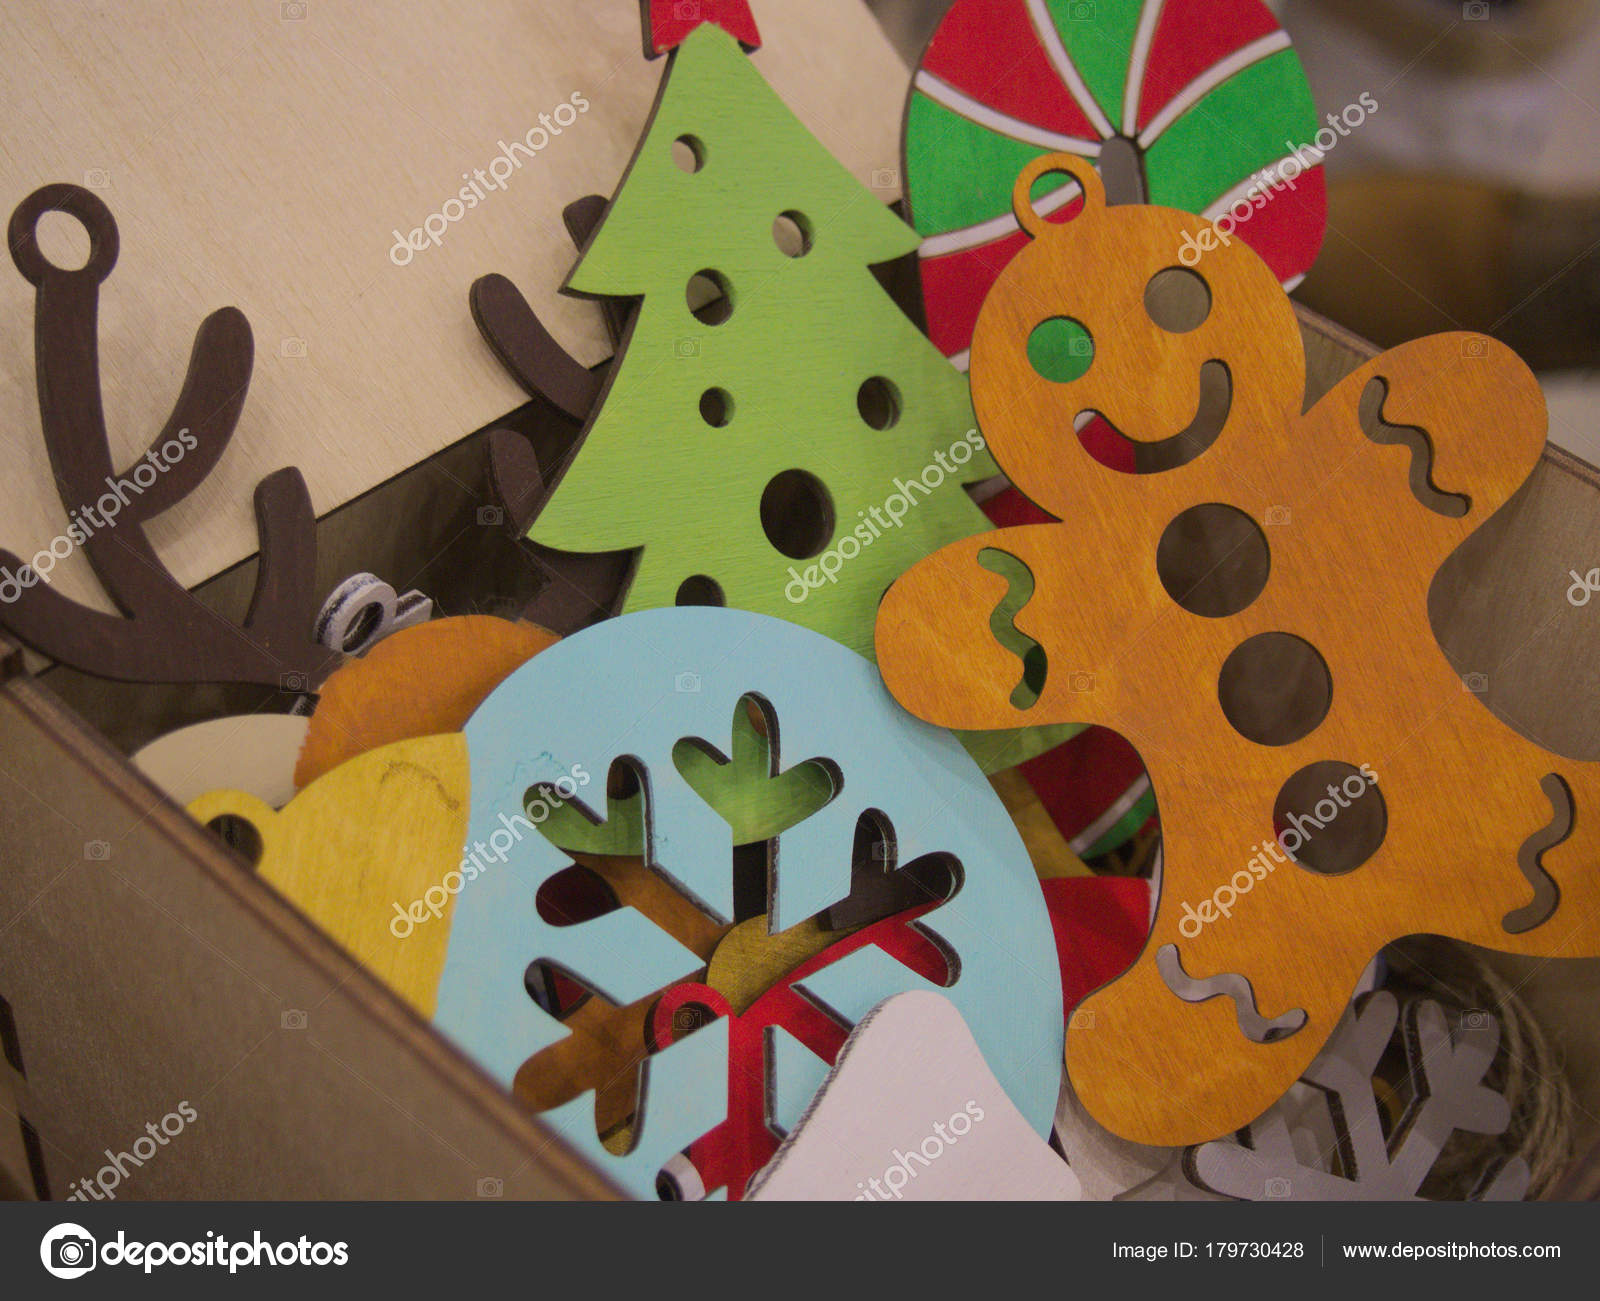 Painted Wooden Gingerbread Man Snowflake Flat Figurine Christmas